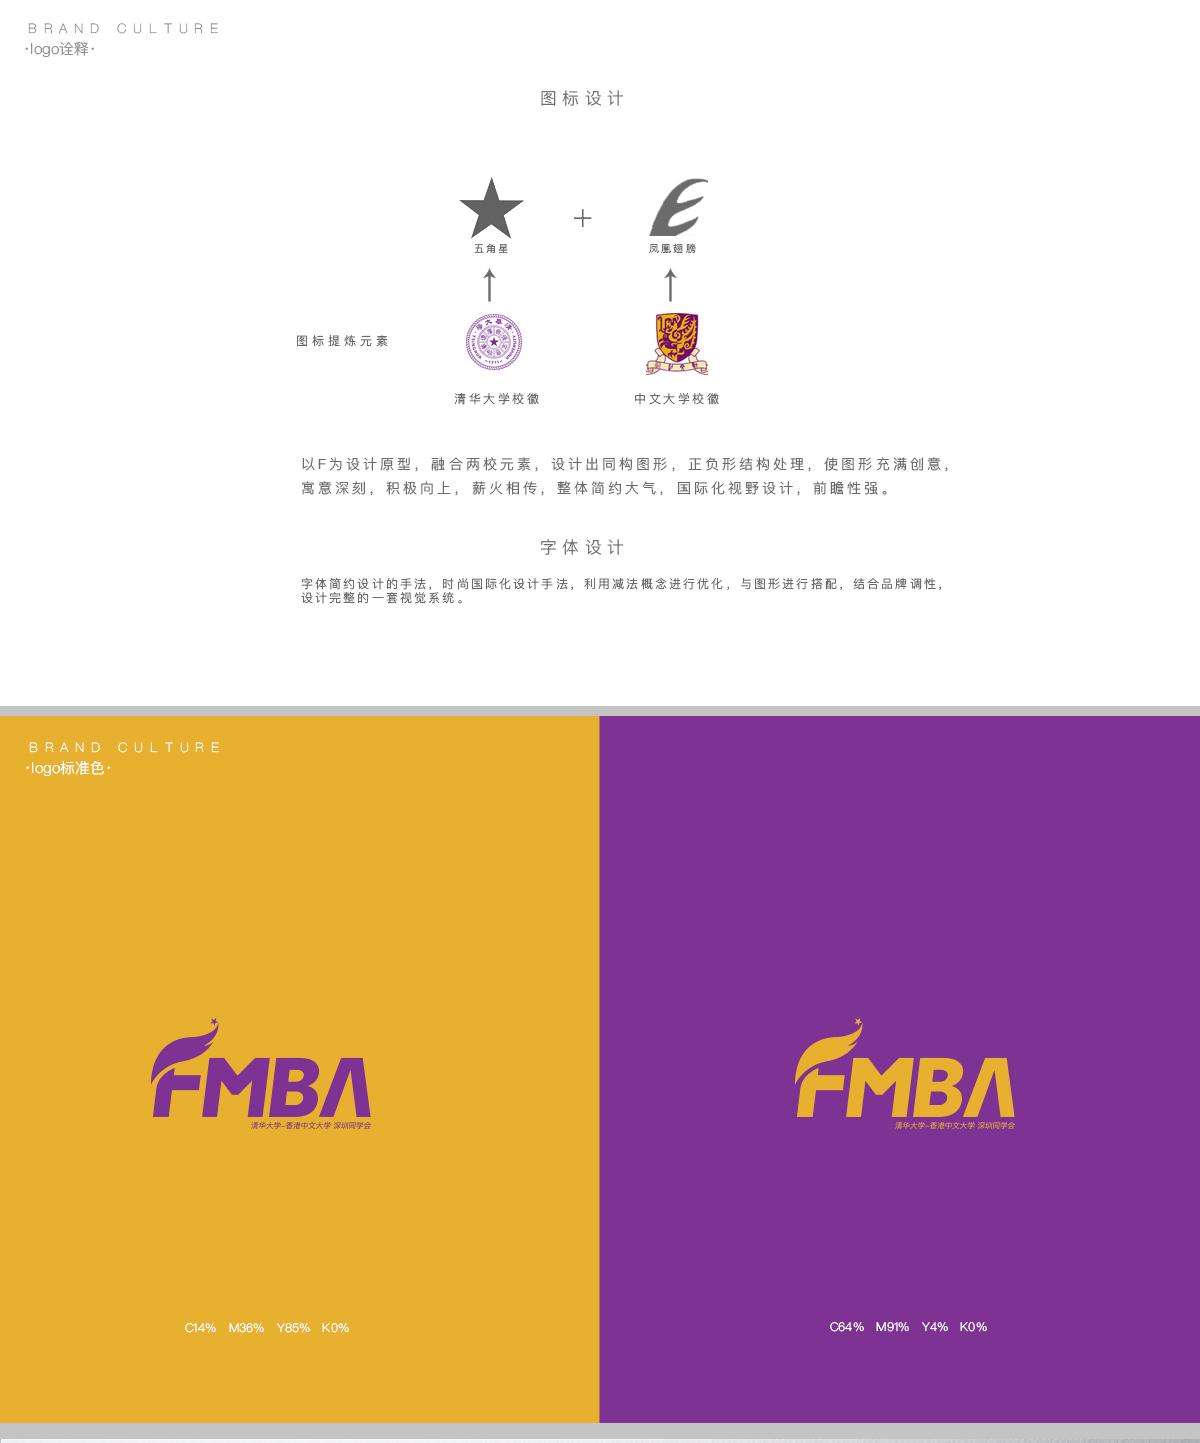 清华大学Finance MBA项目logo设计 vi设计